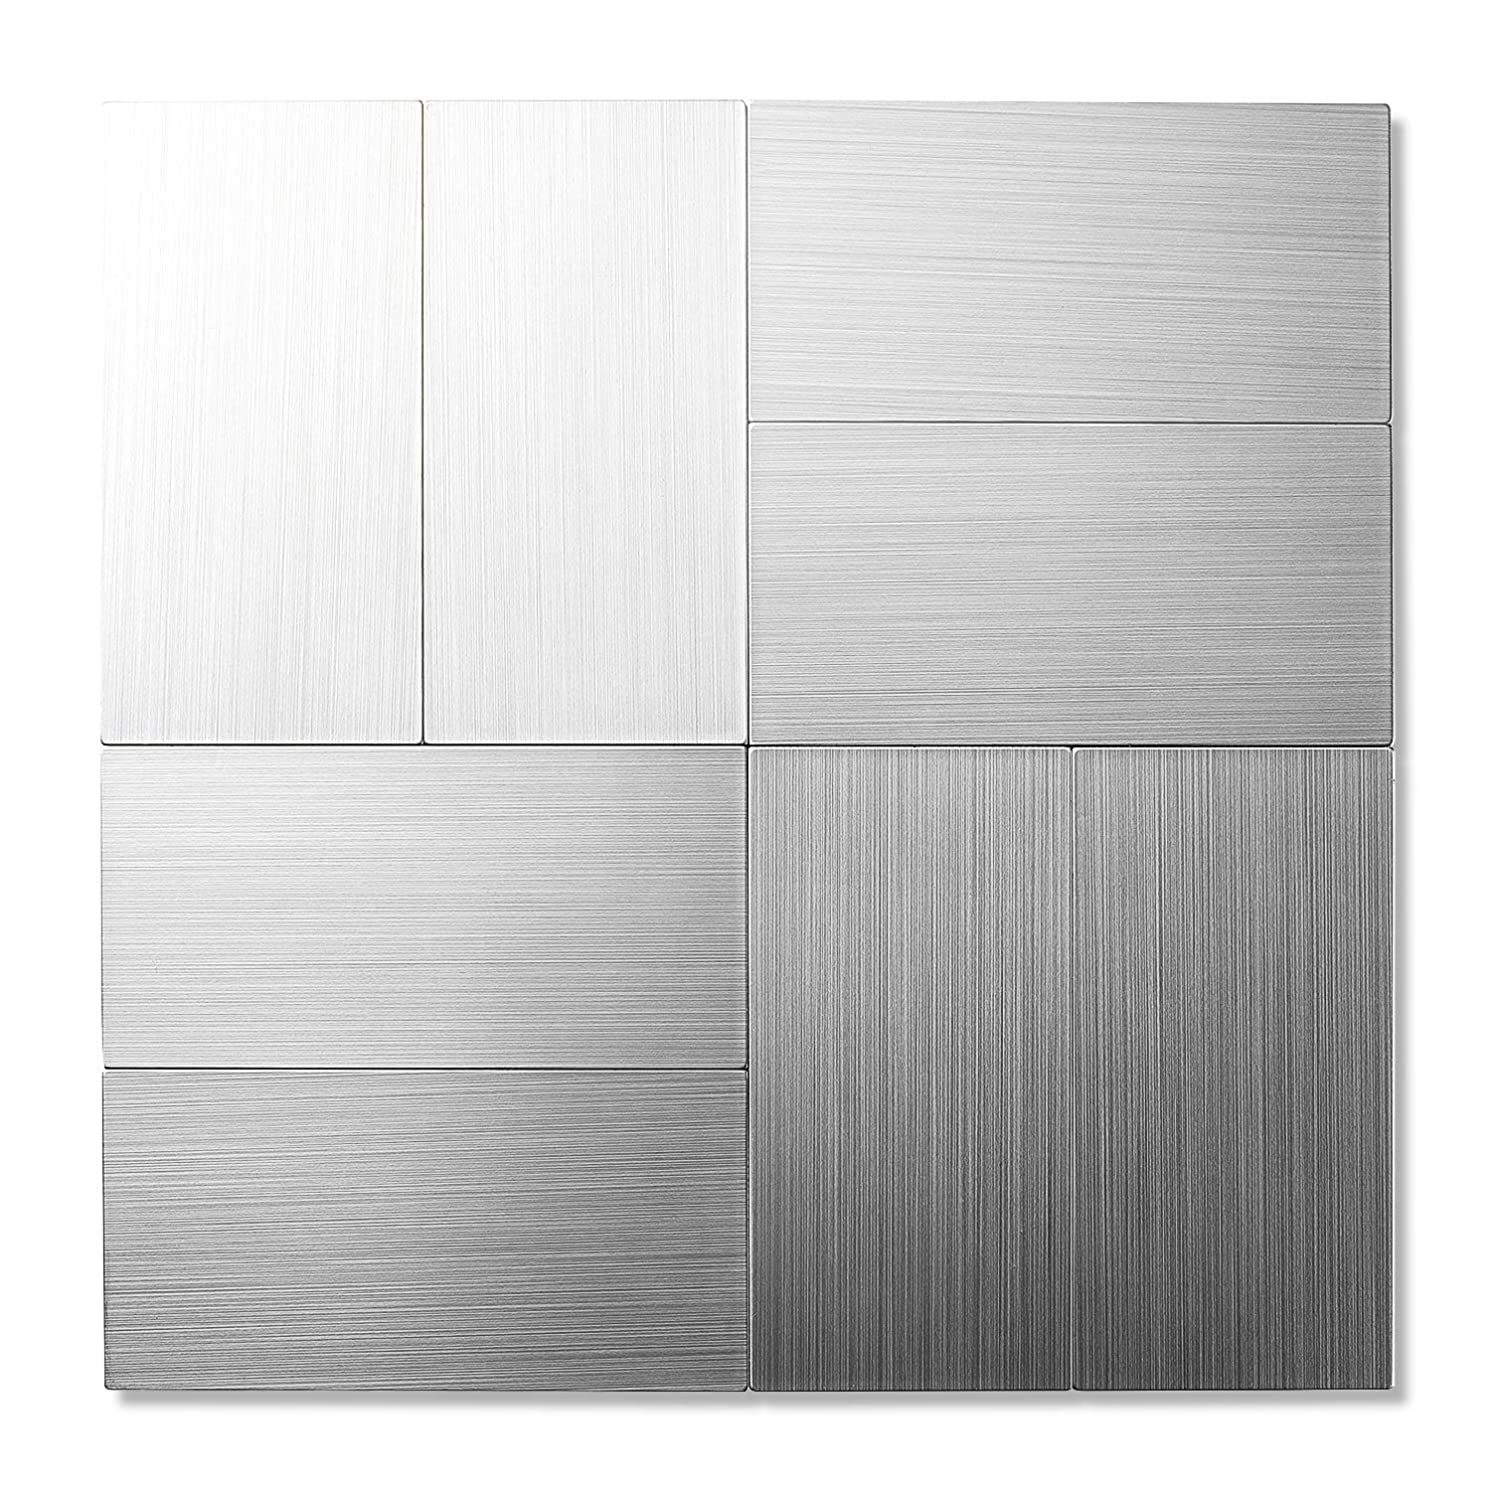 Backsplash Tiles Kitchen, Wall Tiles for Kitchen Backsplash(12x12 Sample Sheet)